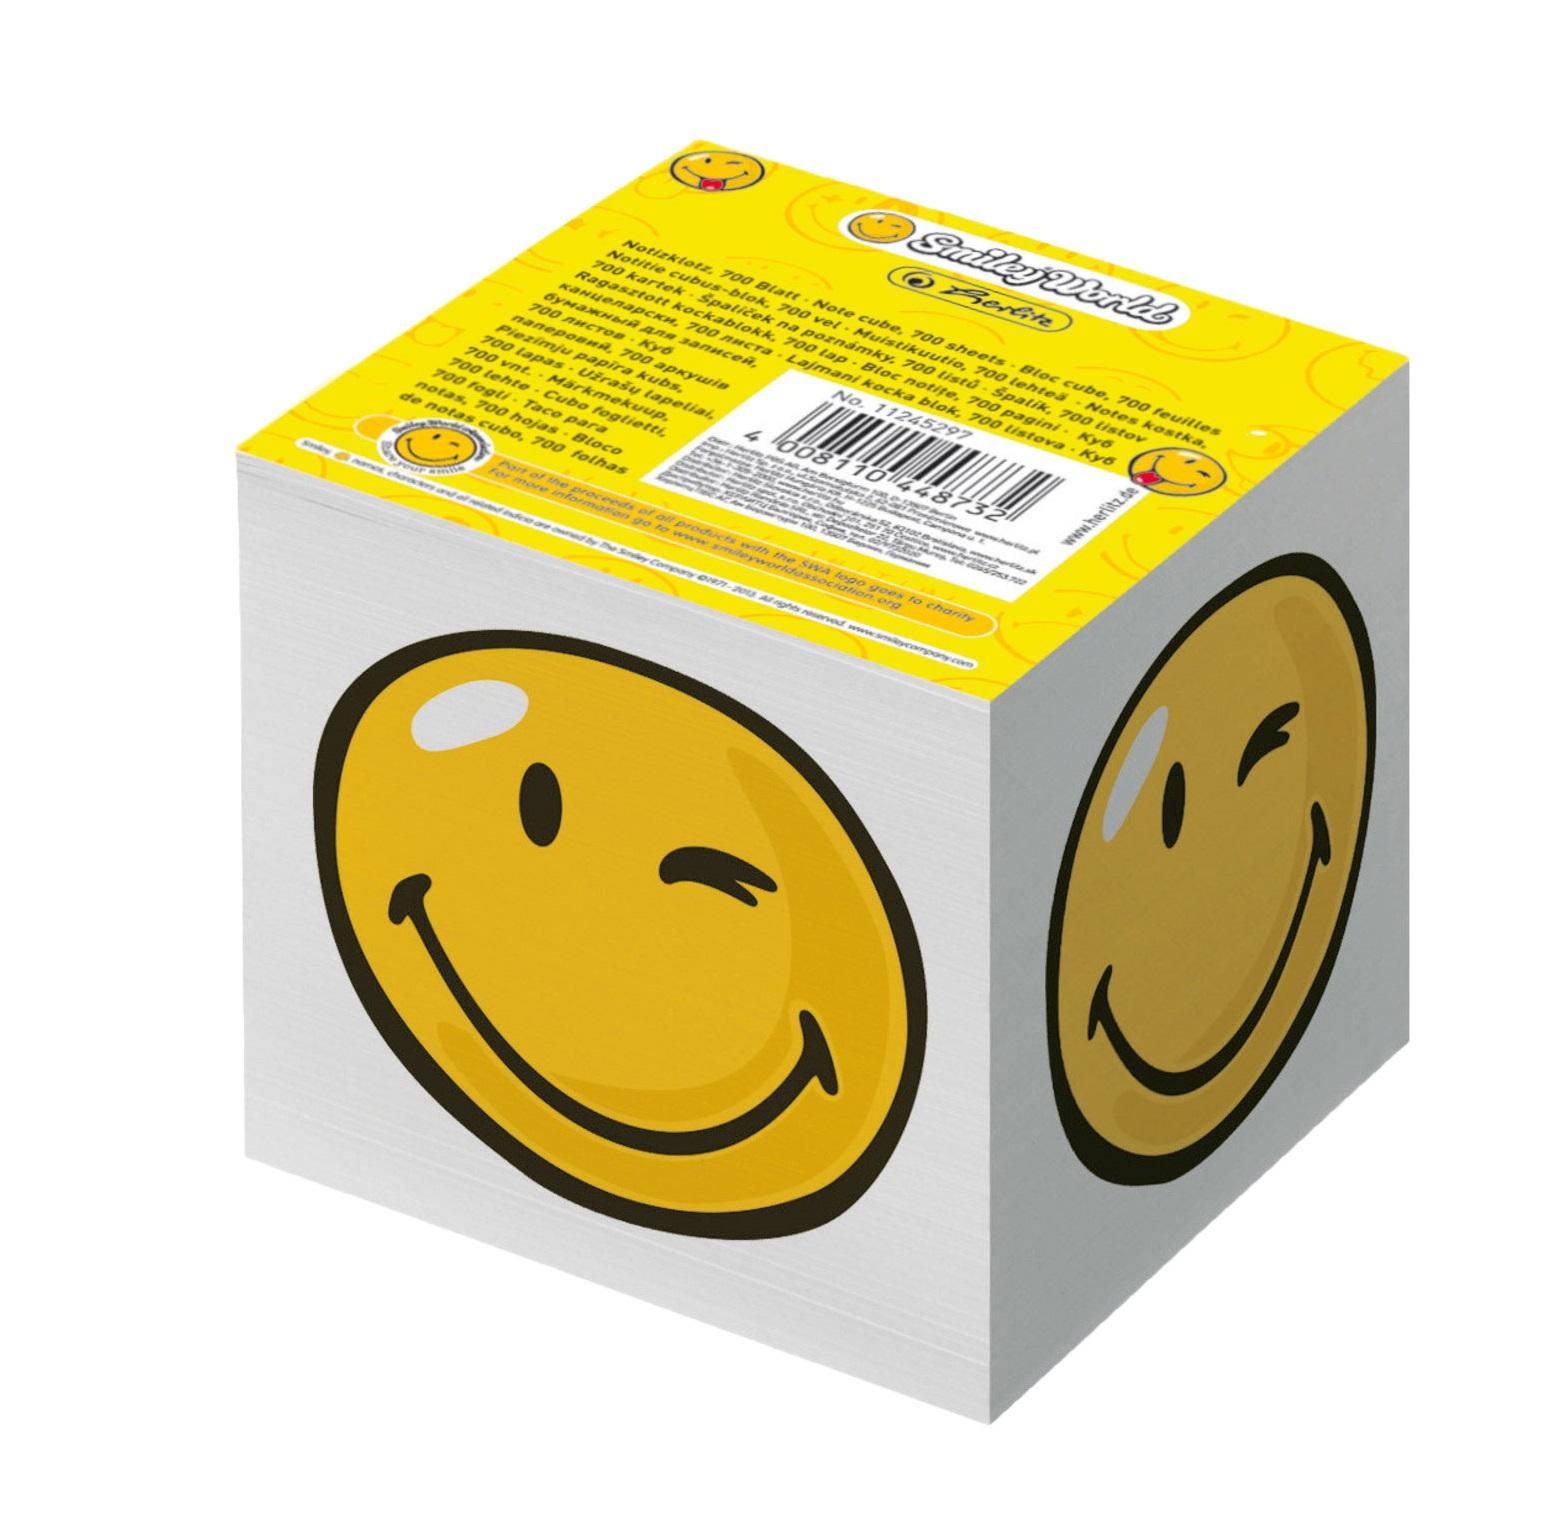 Cub din hartie alb 9 x 9cm 80 g/mp 700 file/set HERLITZ Smiley